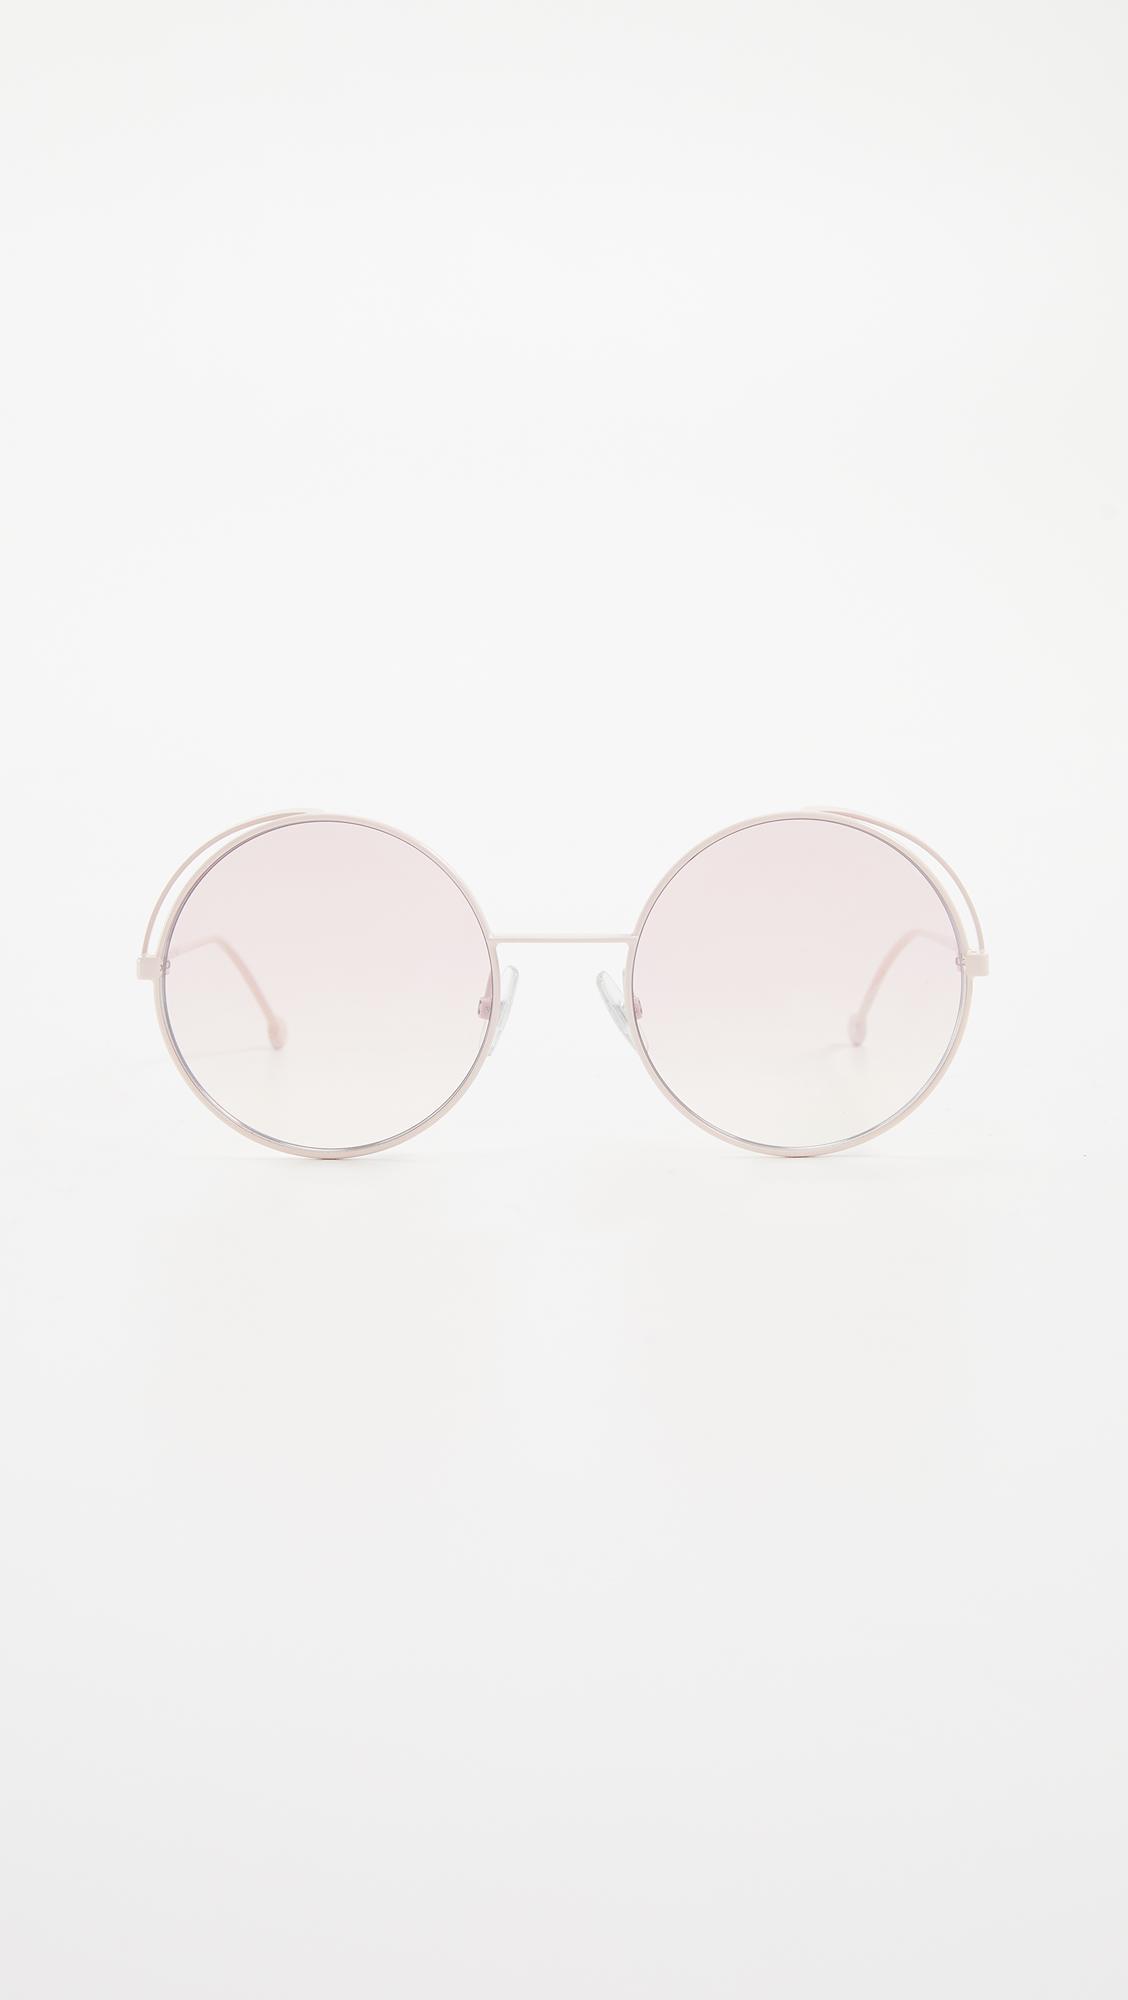 ee4effc046a3 Fendi - Pink Round Metal Logo Sunglasses - Lyst. View fullscreen